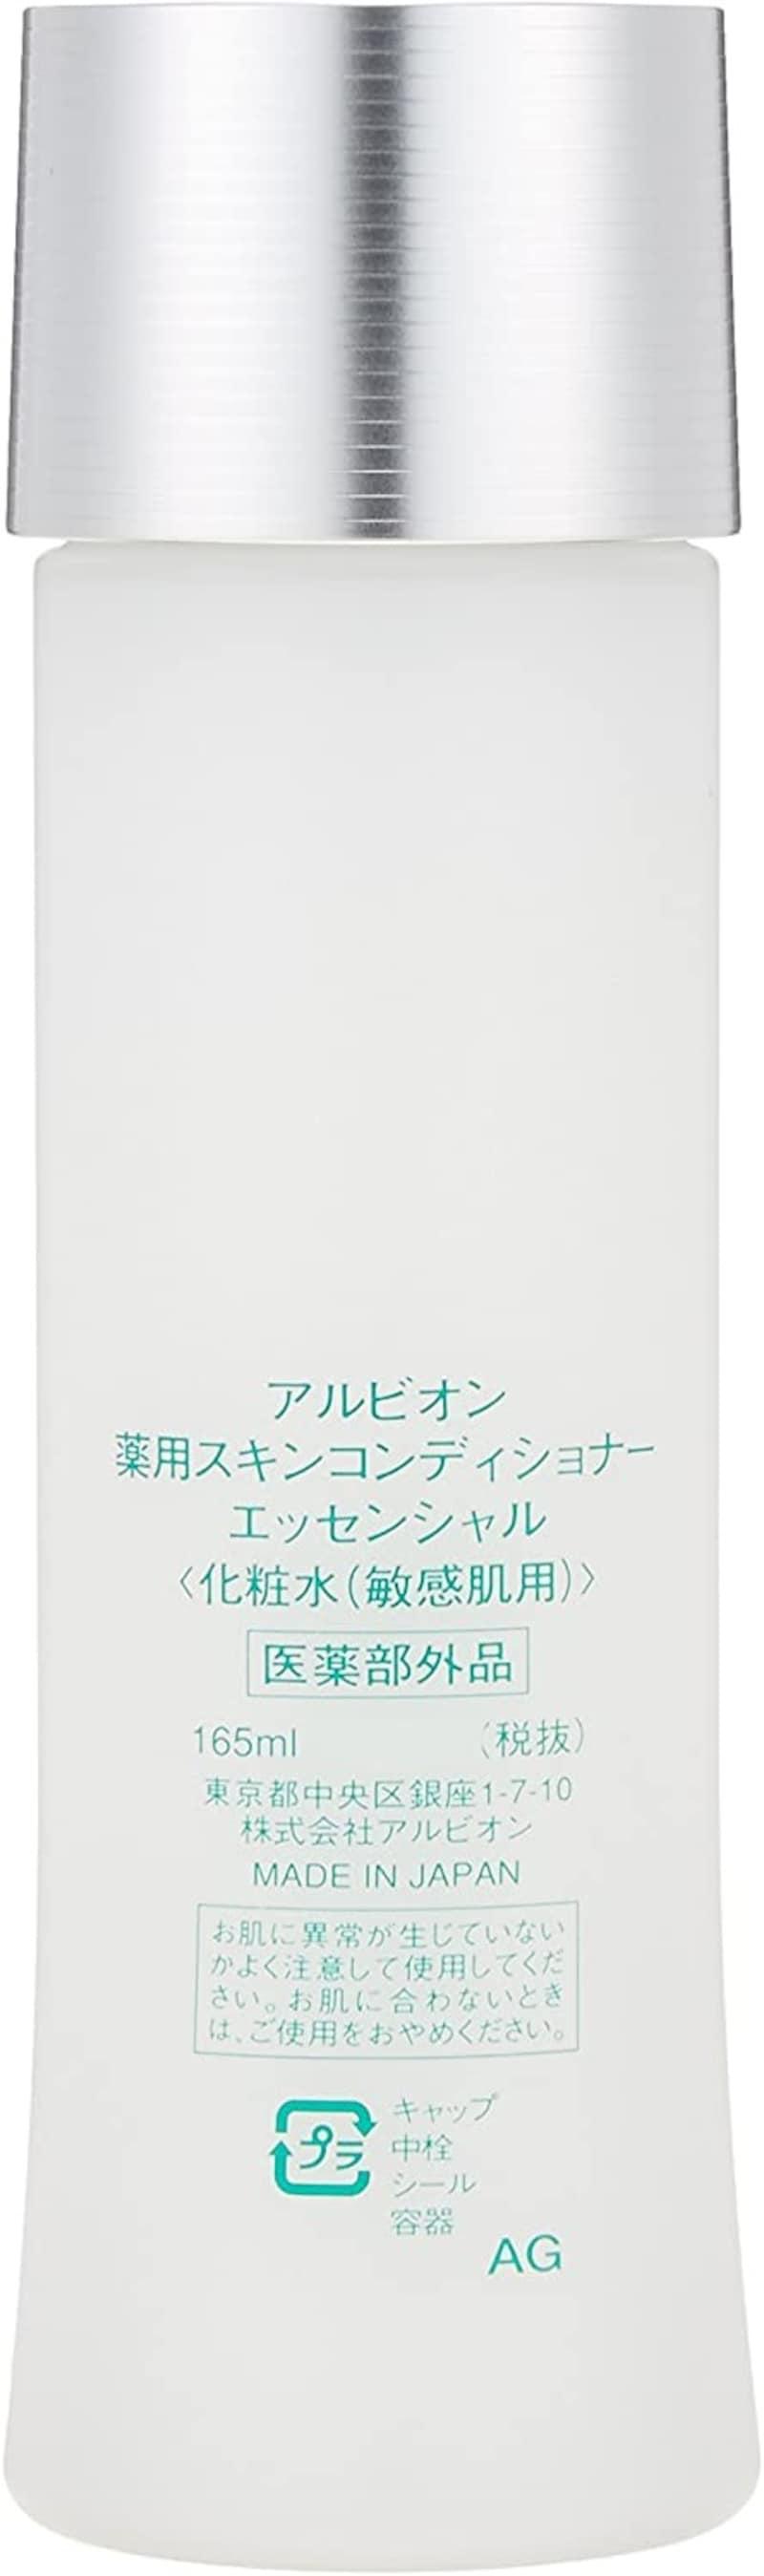 ALBION(アルビオン),薬用スキンコンディショナー エッセンシャル